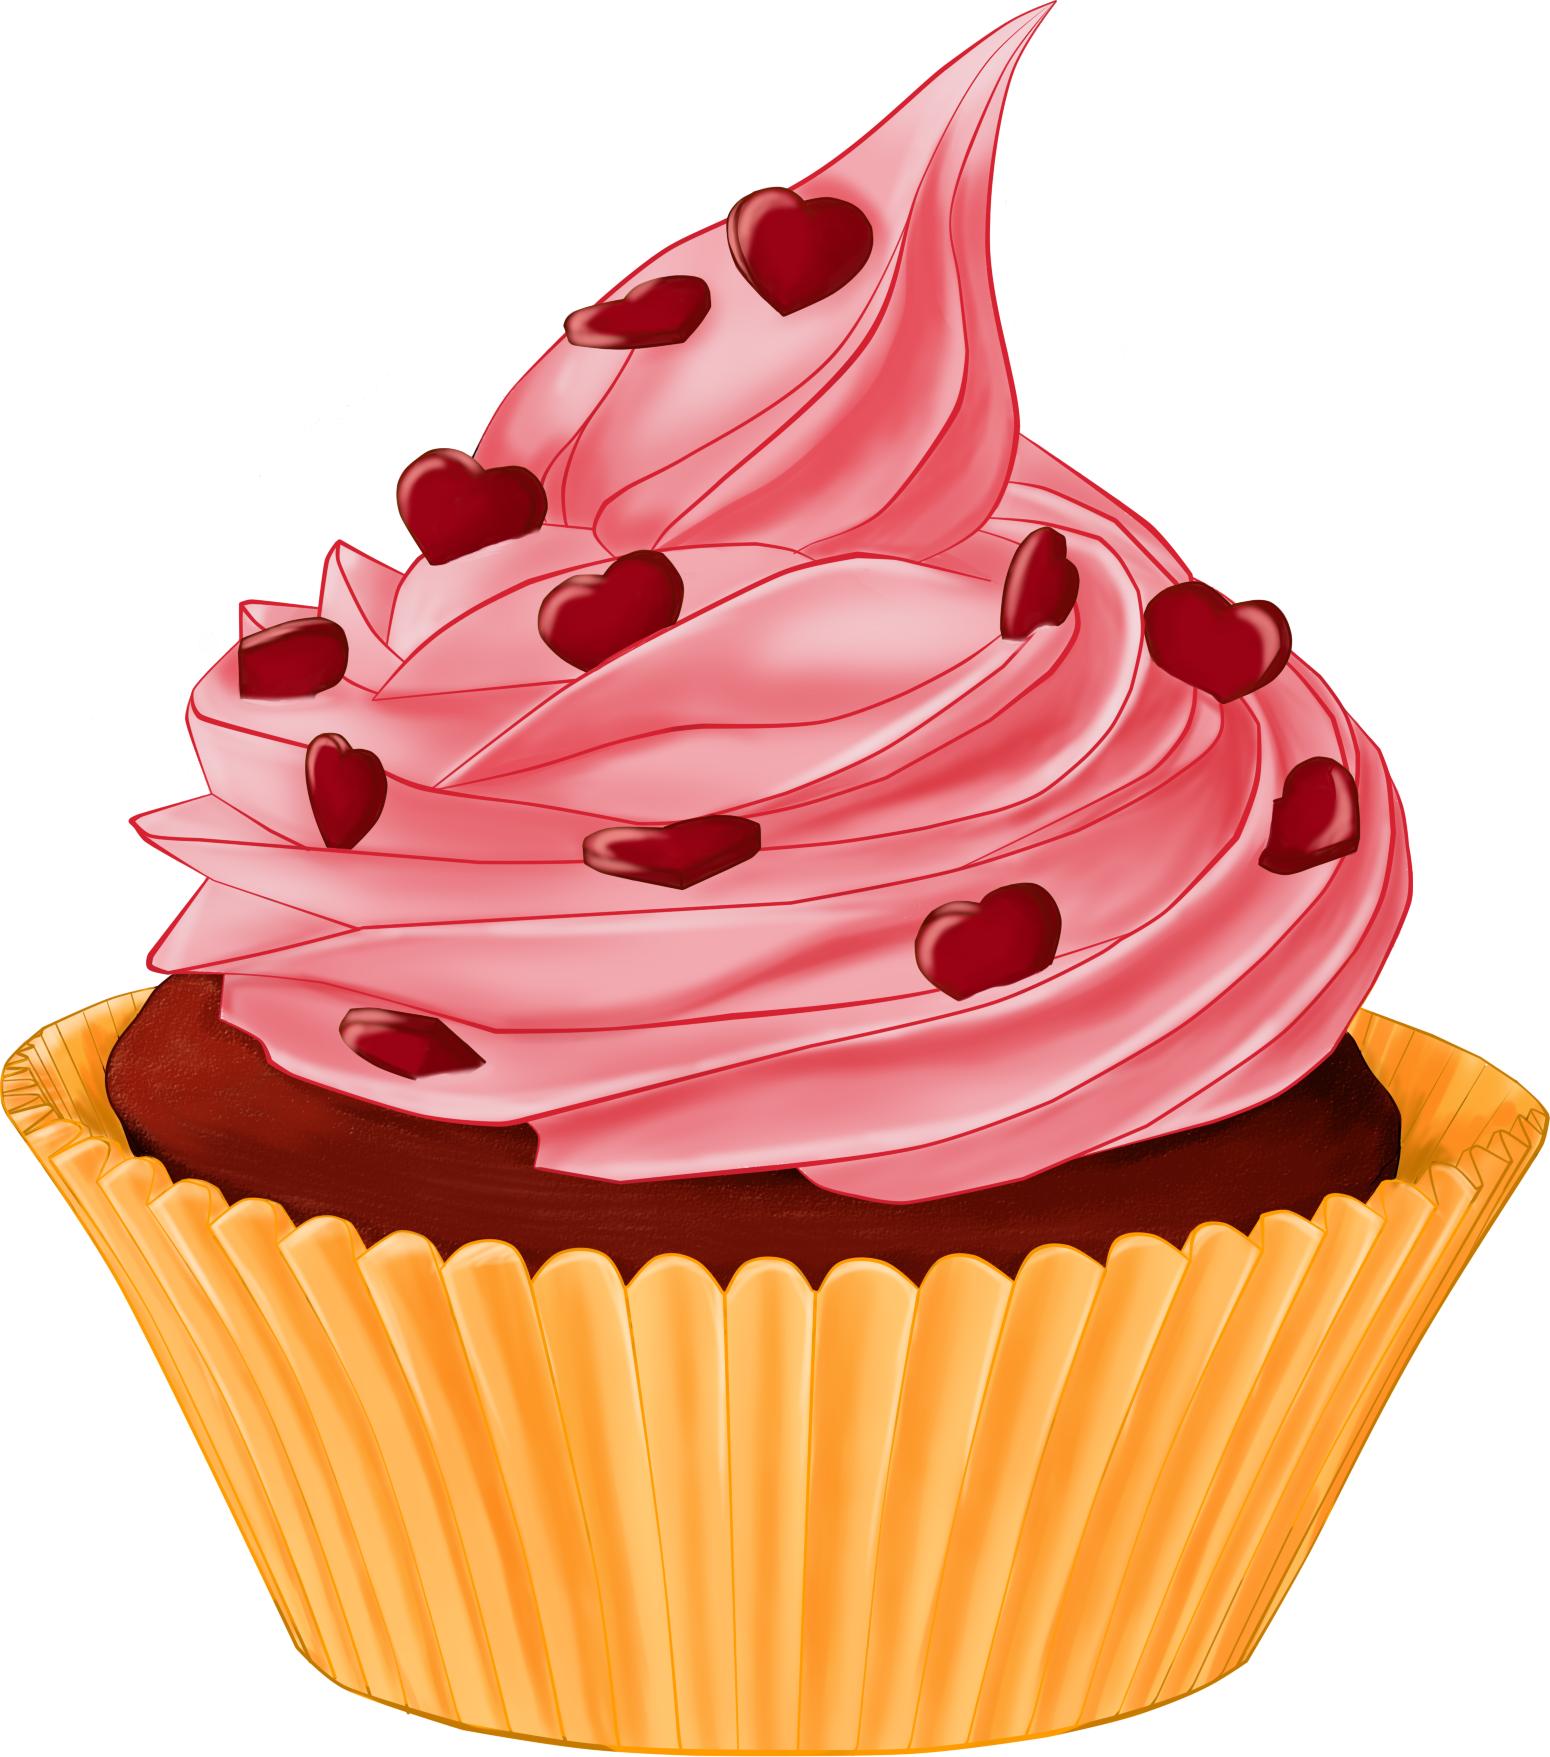 Cupcake PNG HD